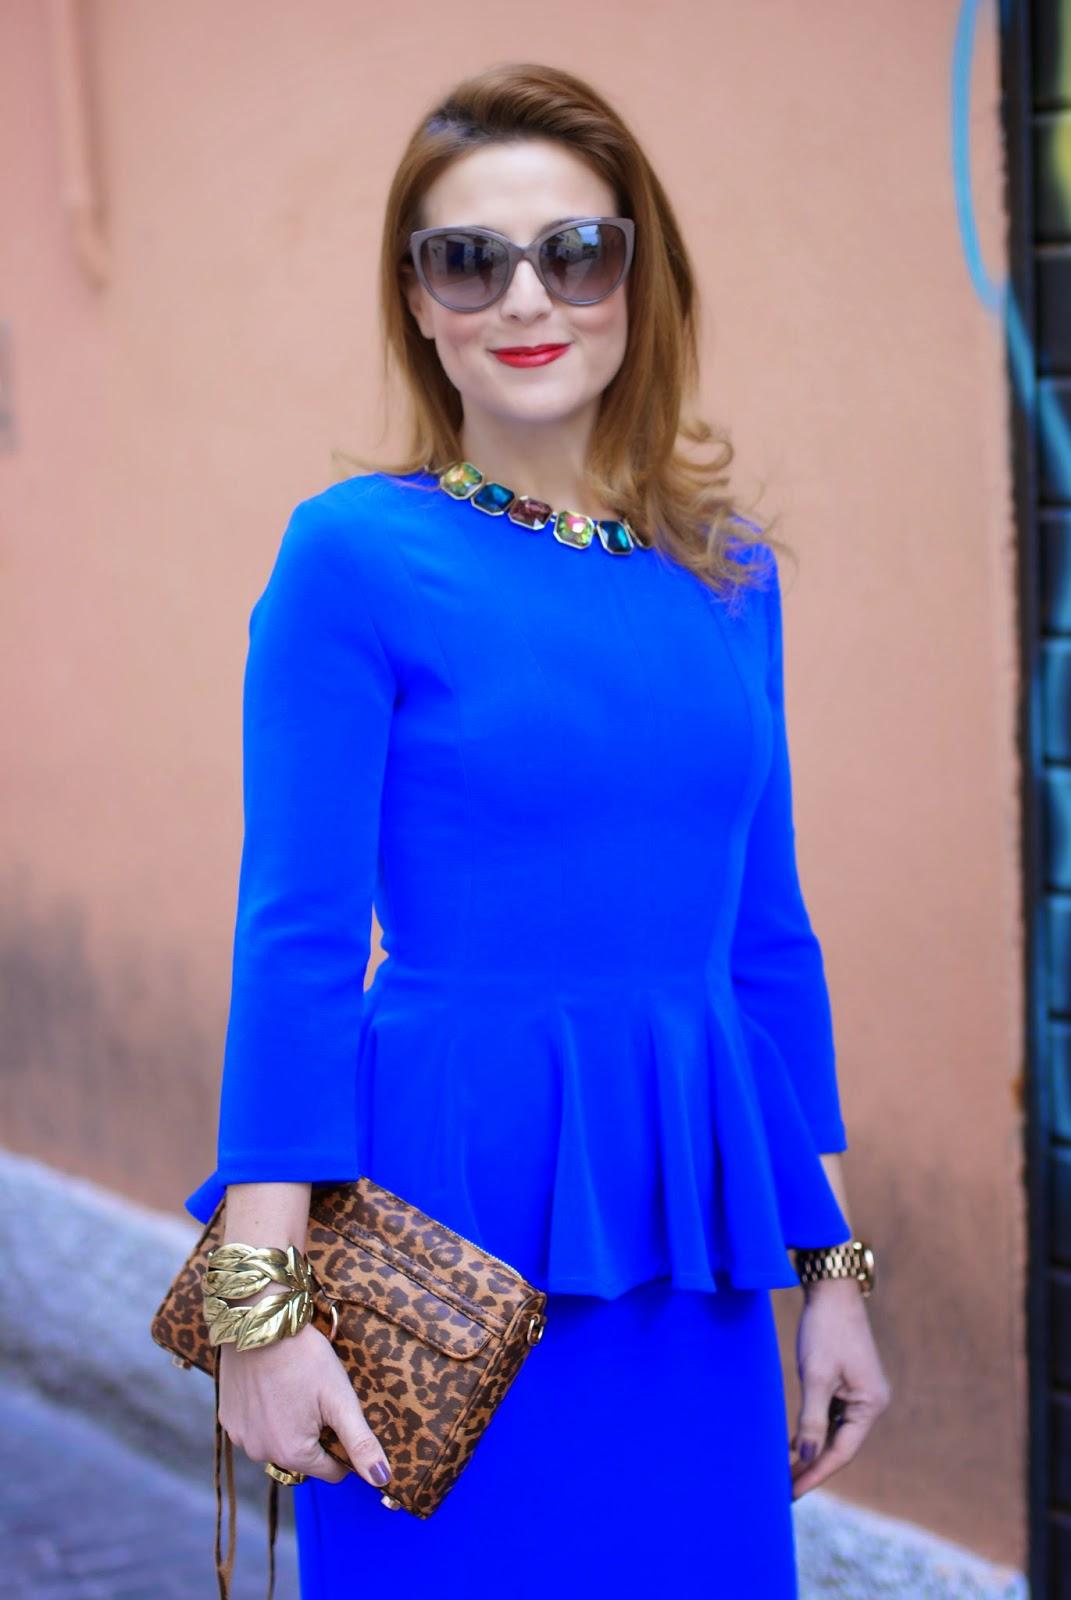 Isabel Garcia peplum dress with midi skirt, Rebecca Minkoff mini MAC clutch in leopard, Fashion and Cookies fashion blog, fashion blogger